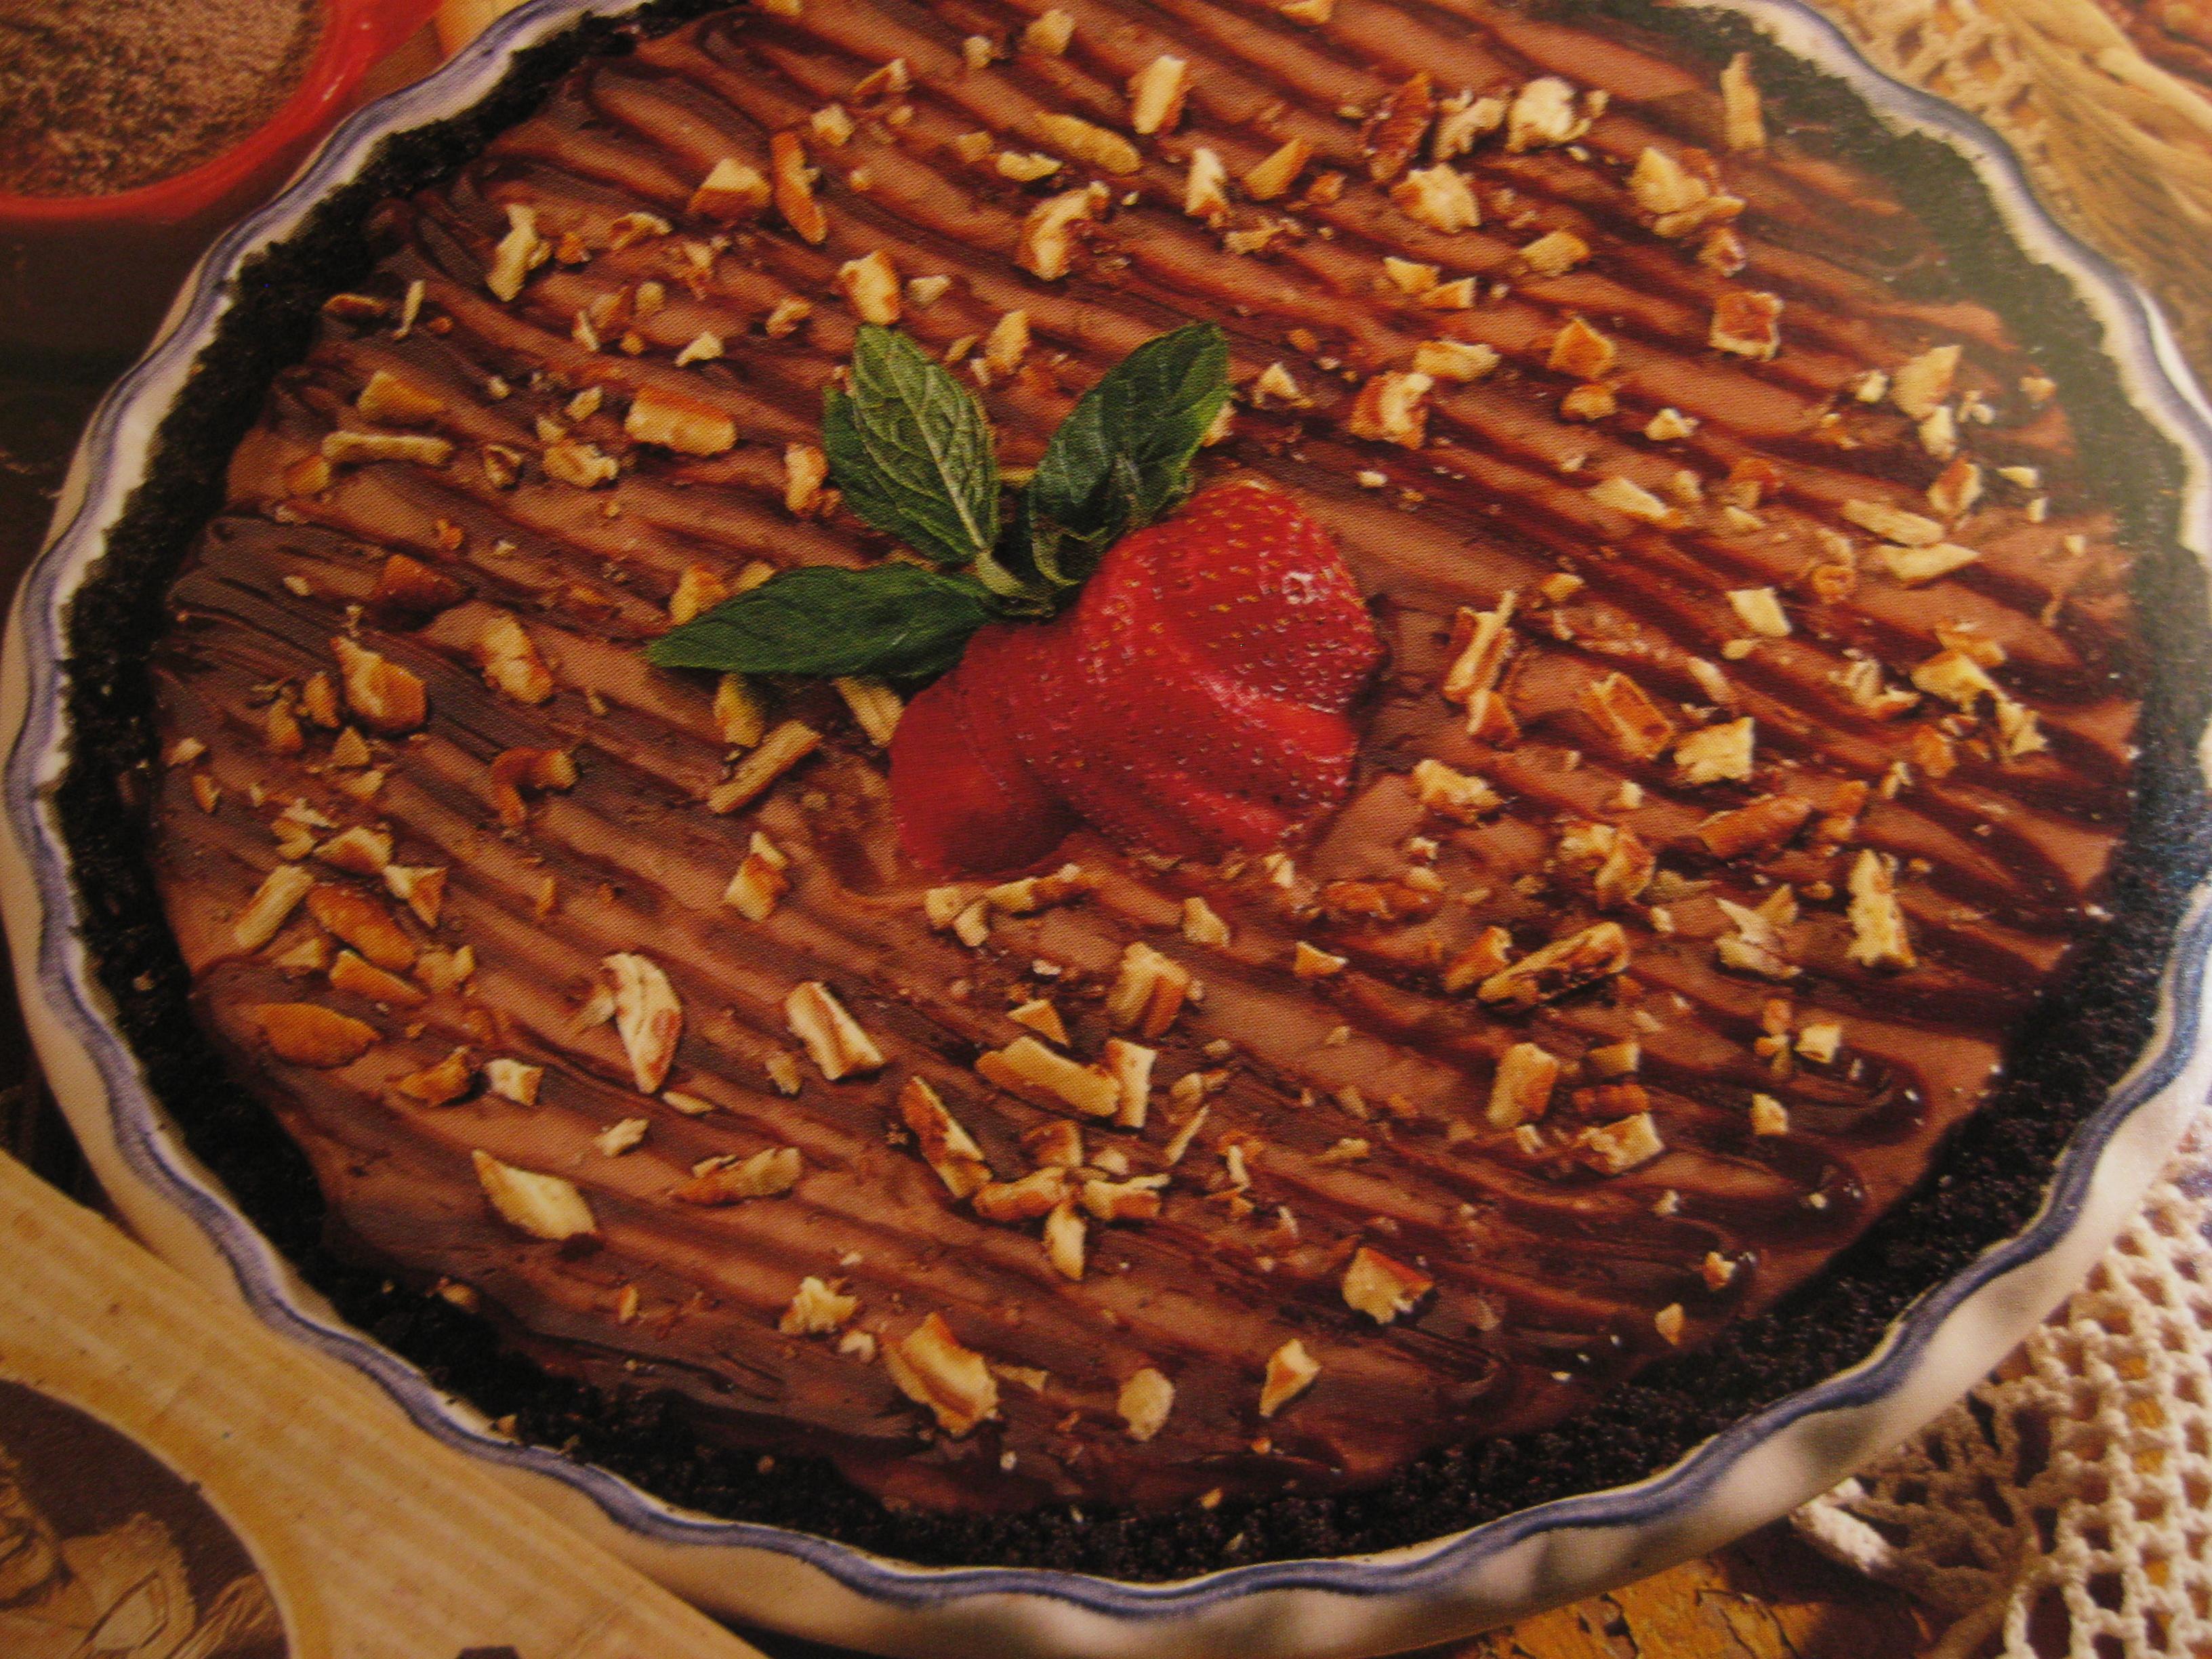 Recipes Course Desserts Chocolate Chocolate Turtle Cheesecake